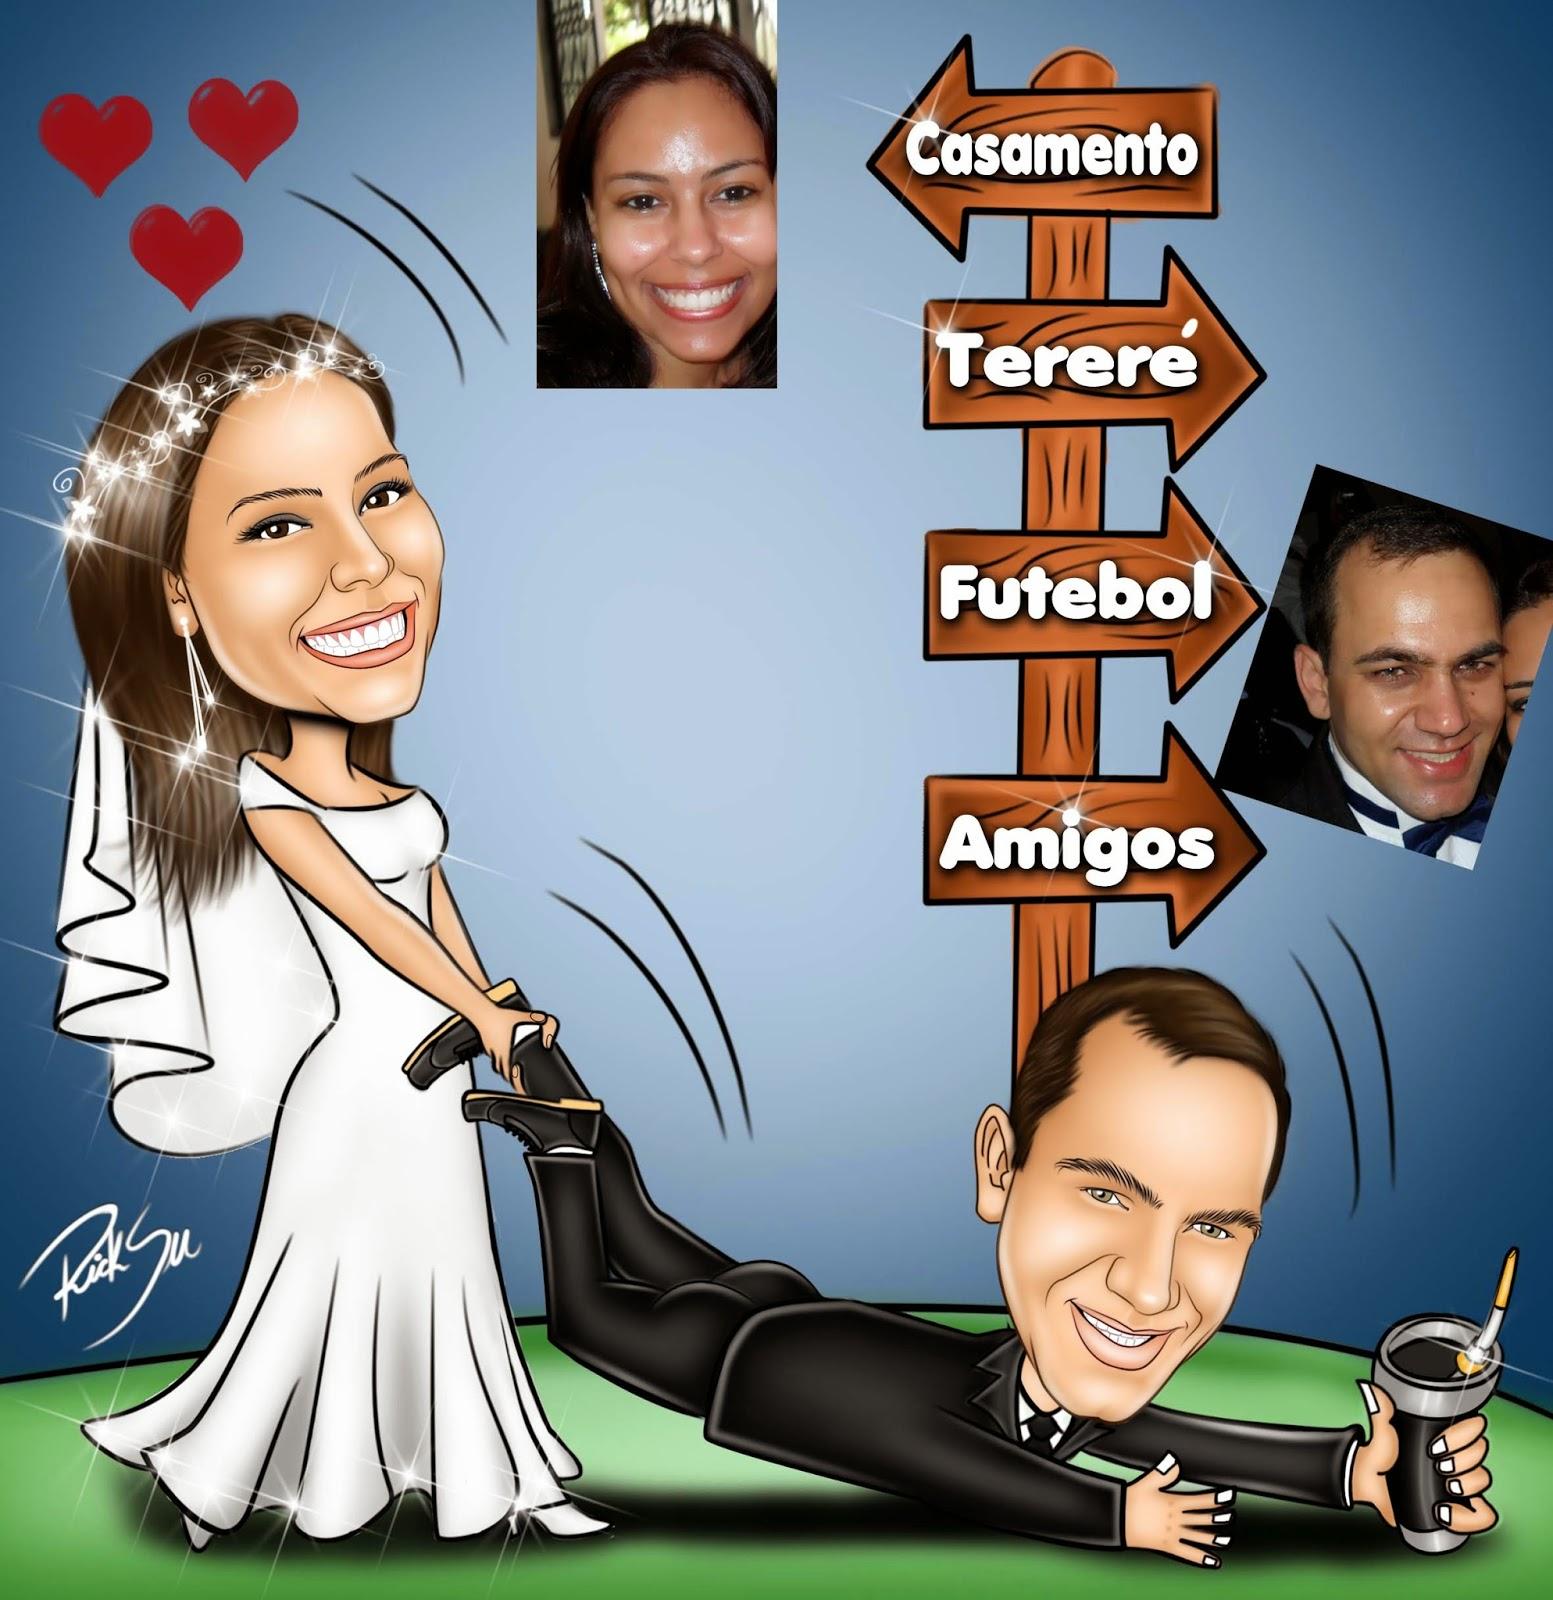 #noivofutebol , #noivoamigos , #casalfeliz